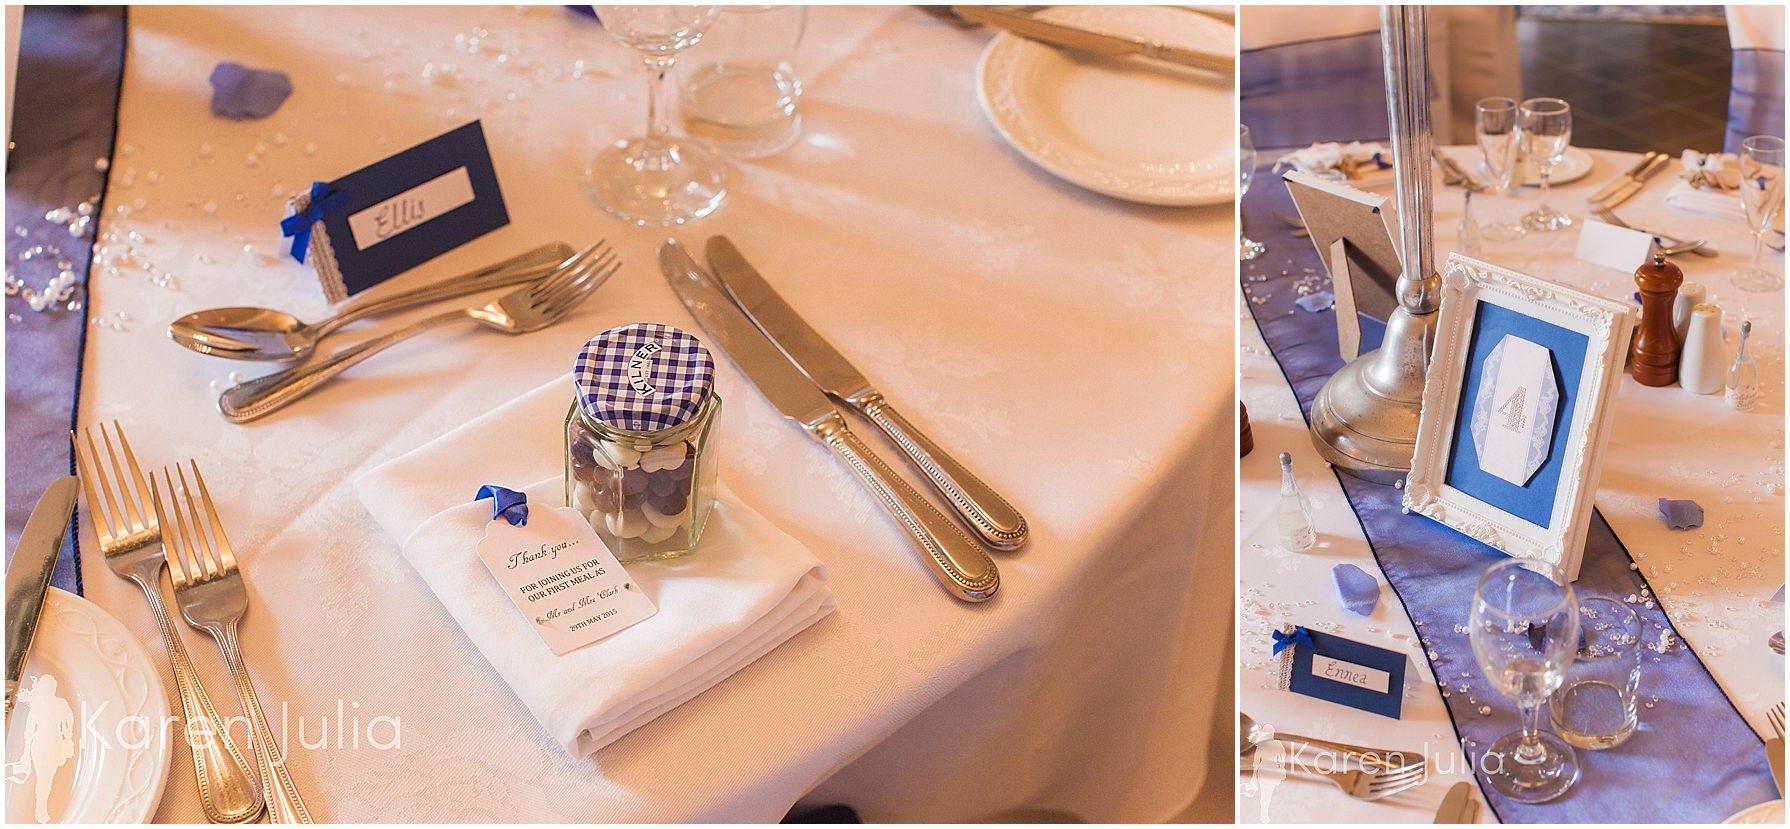 Spring-House-Hotel-Wedding-Photography-15